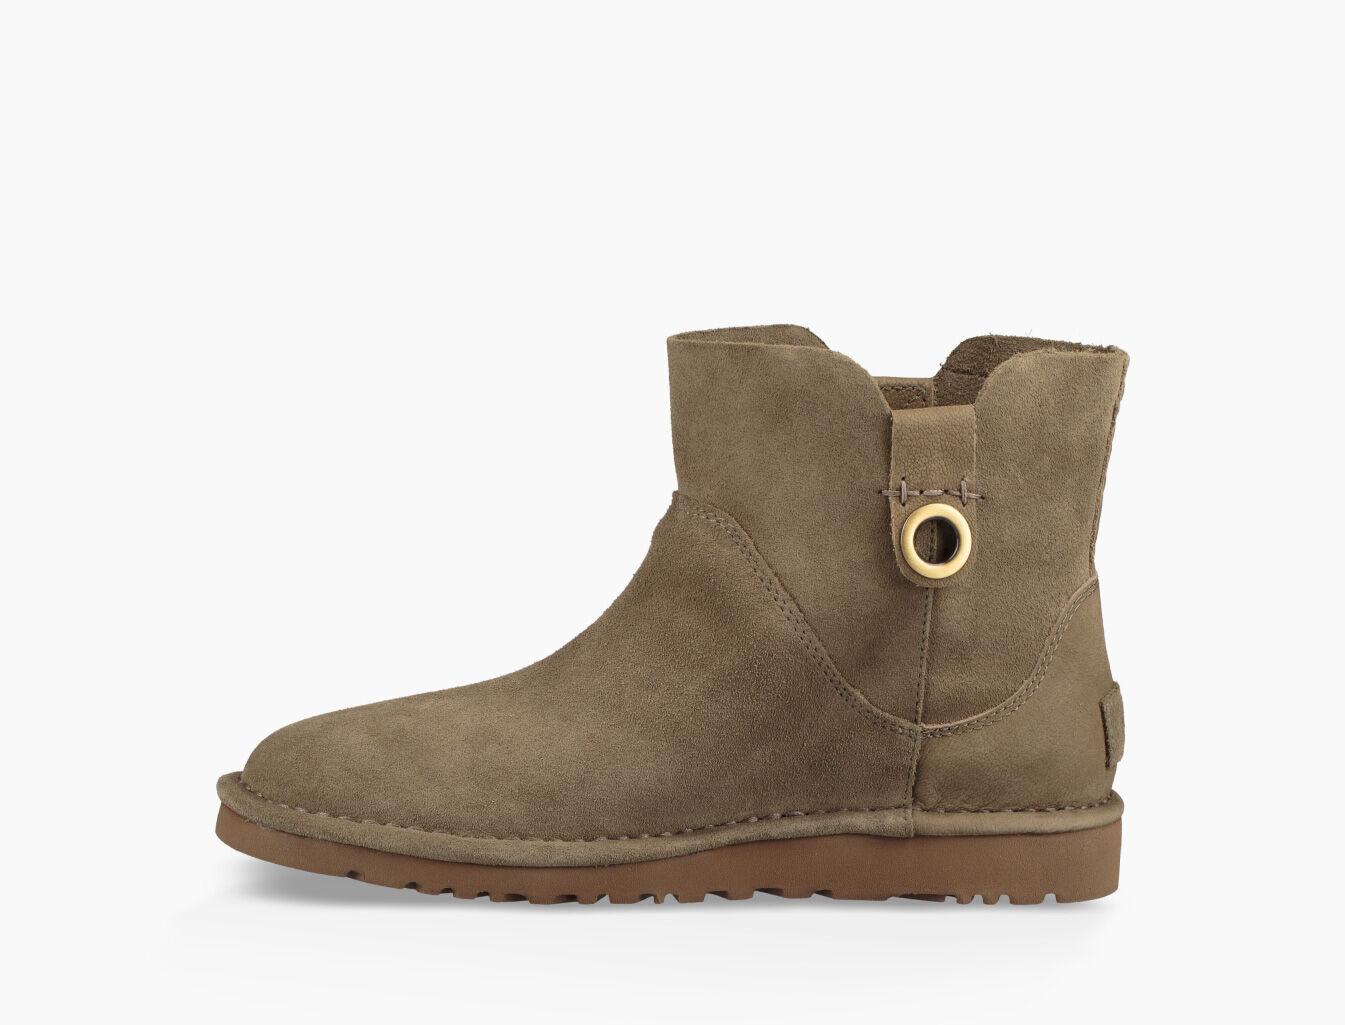 UGG® Gib Classic Boots for Women | UGG